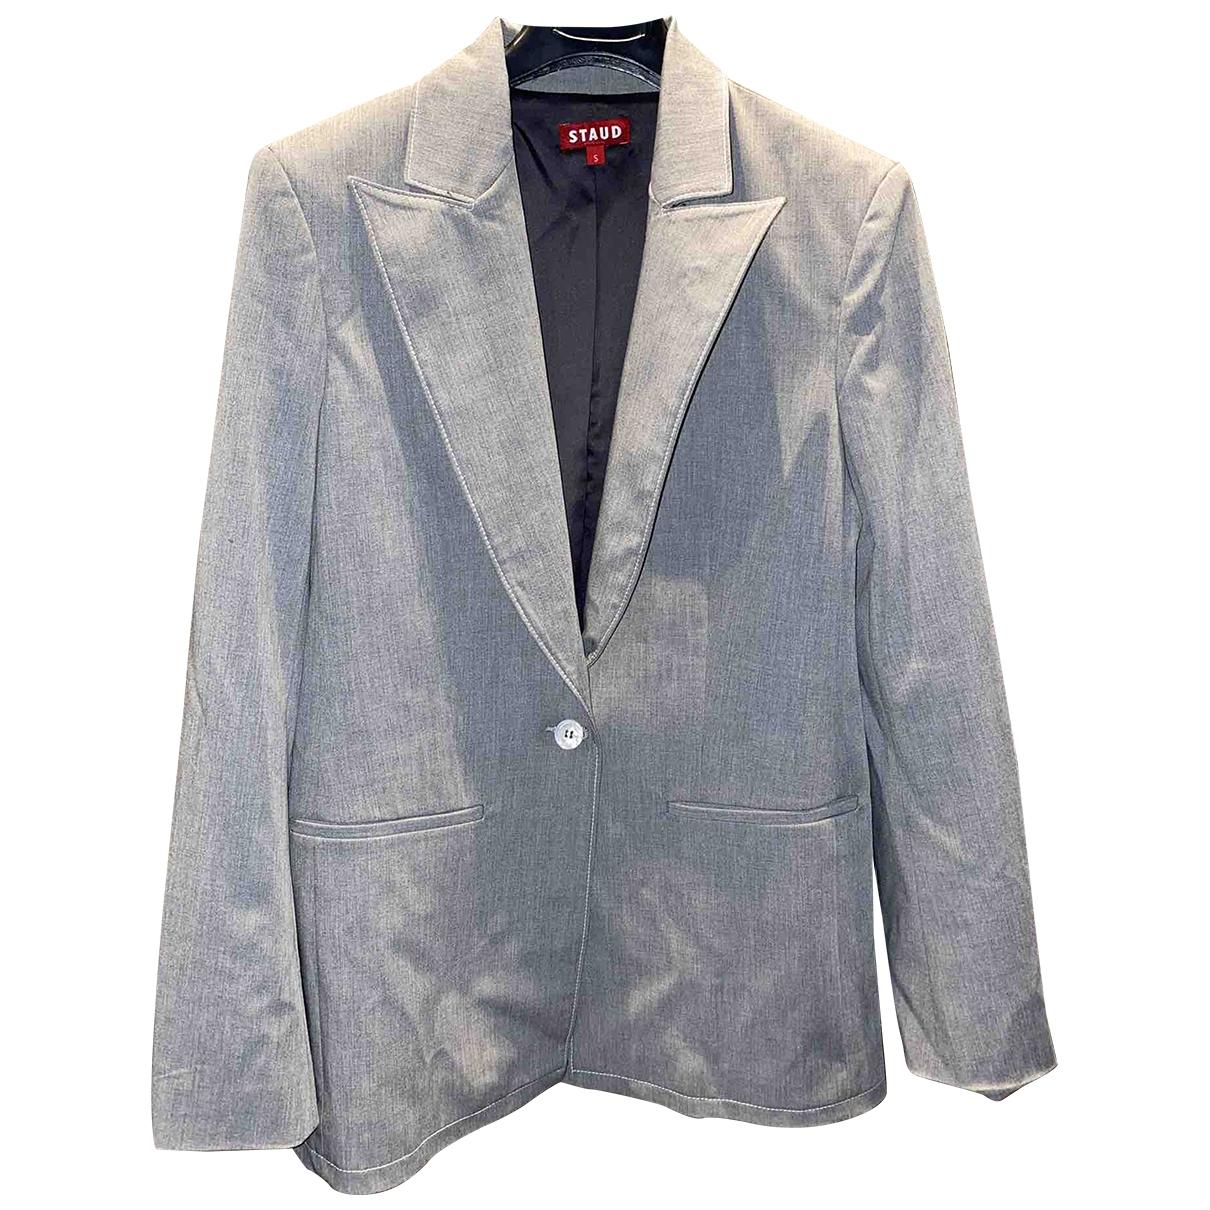 Staud \N Grey jacket for Women S International